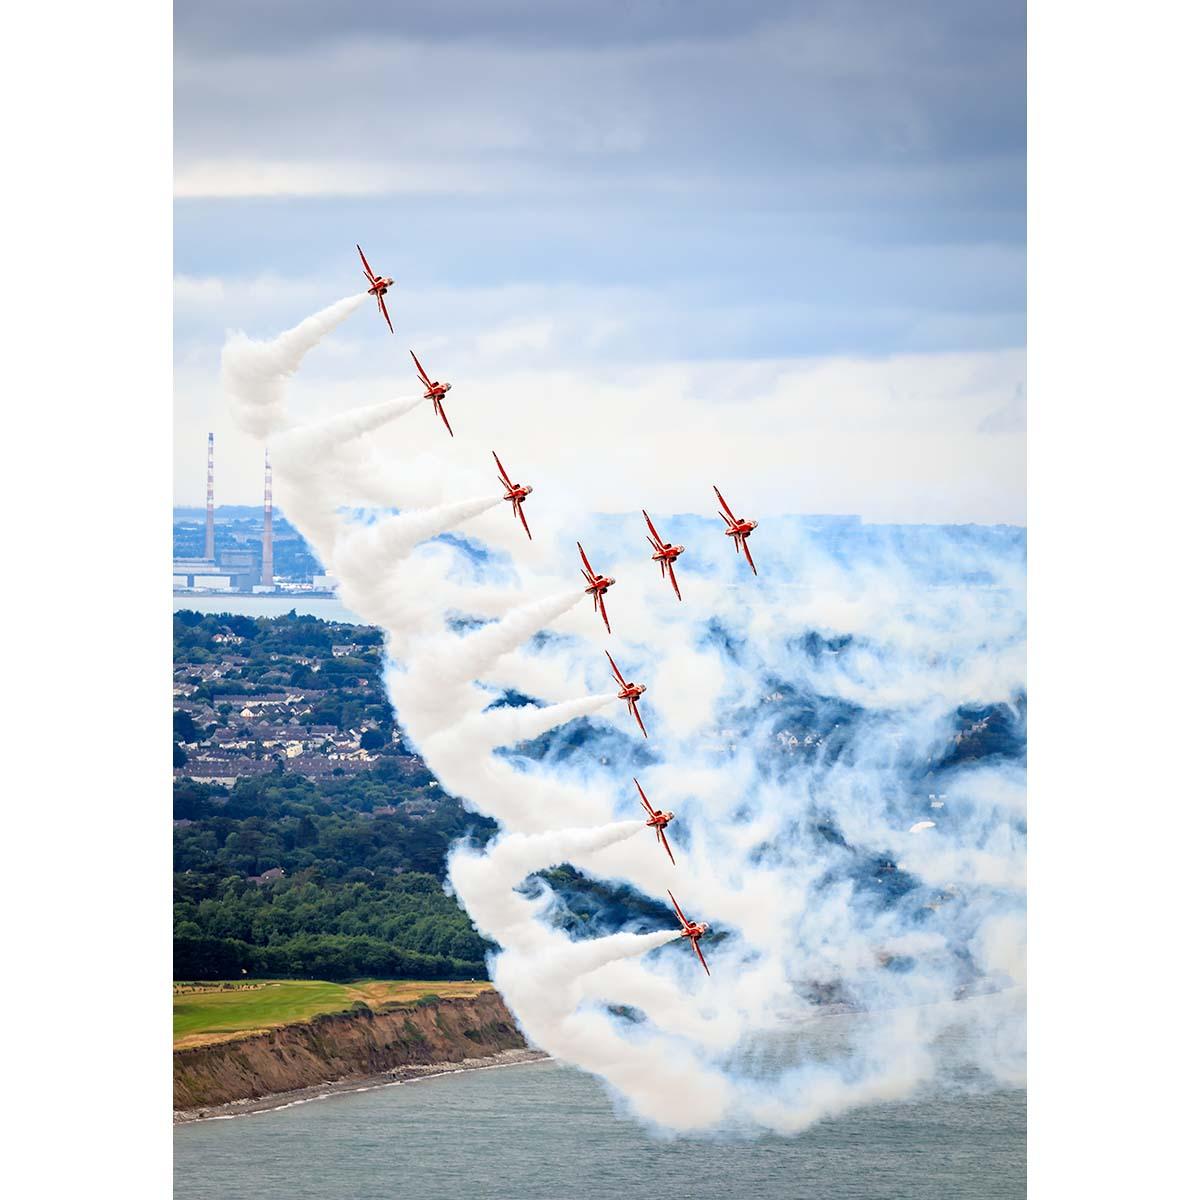 RAF Red Arrows over Bray © Robert Kelly